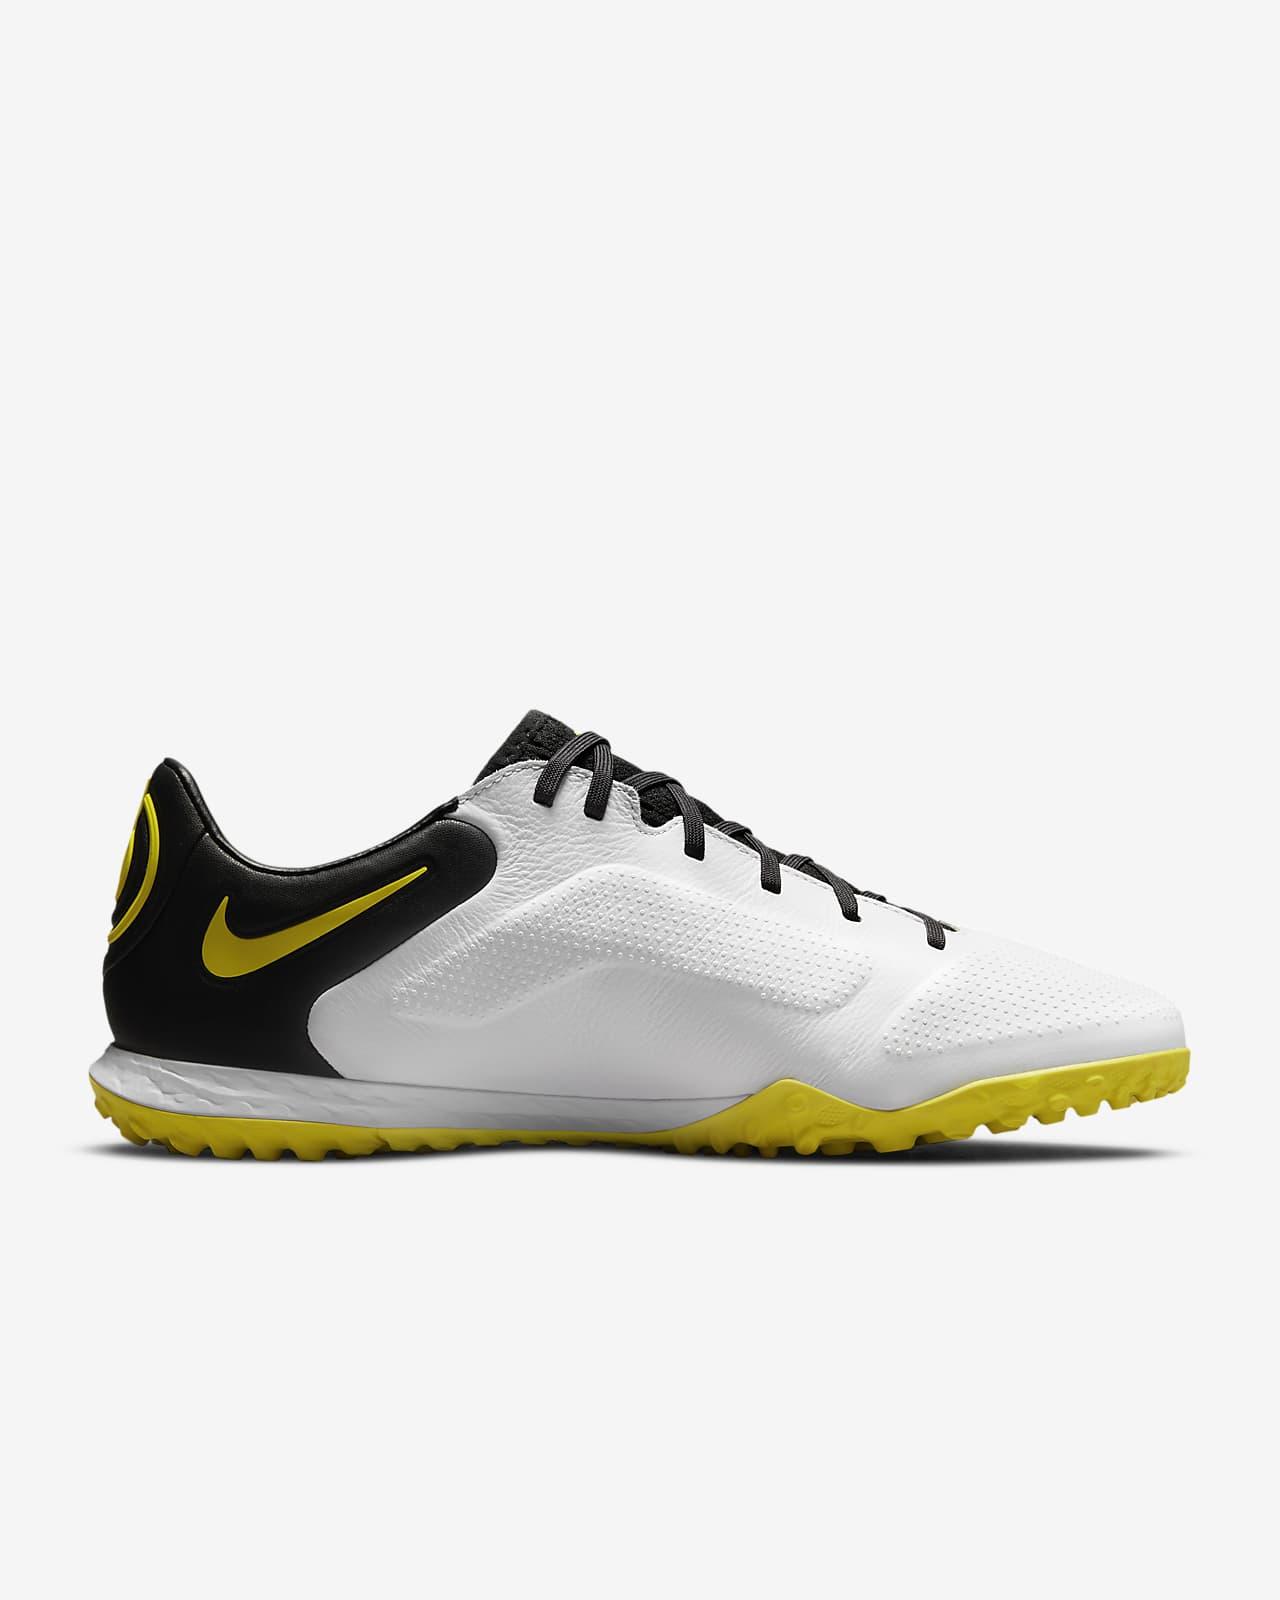 Nike React Tiempo Legend 9 Pro TF Turf Football Shoe. Nike SA